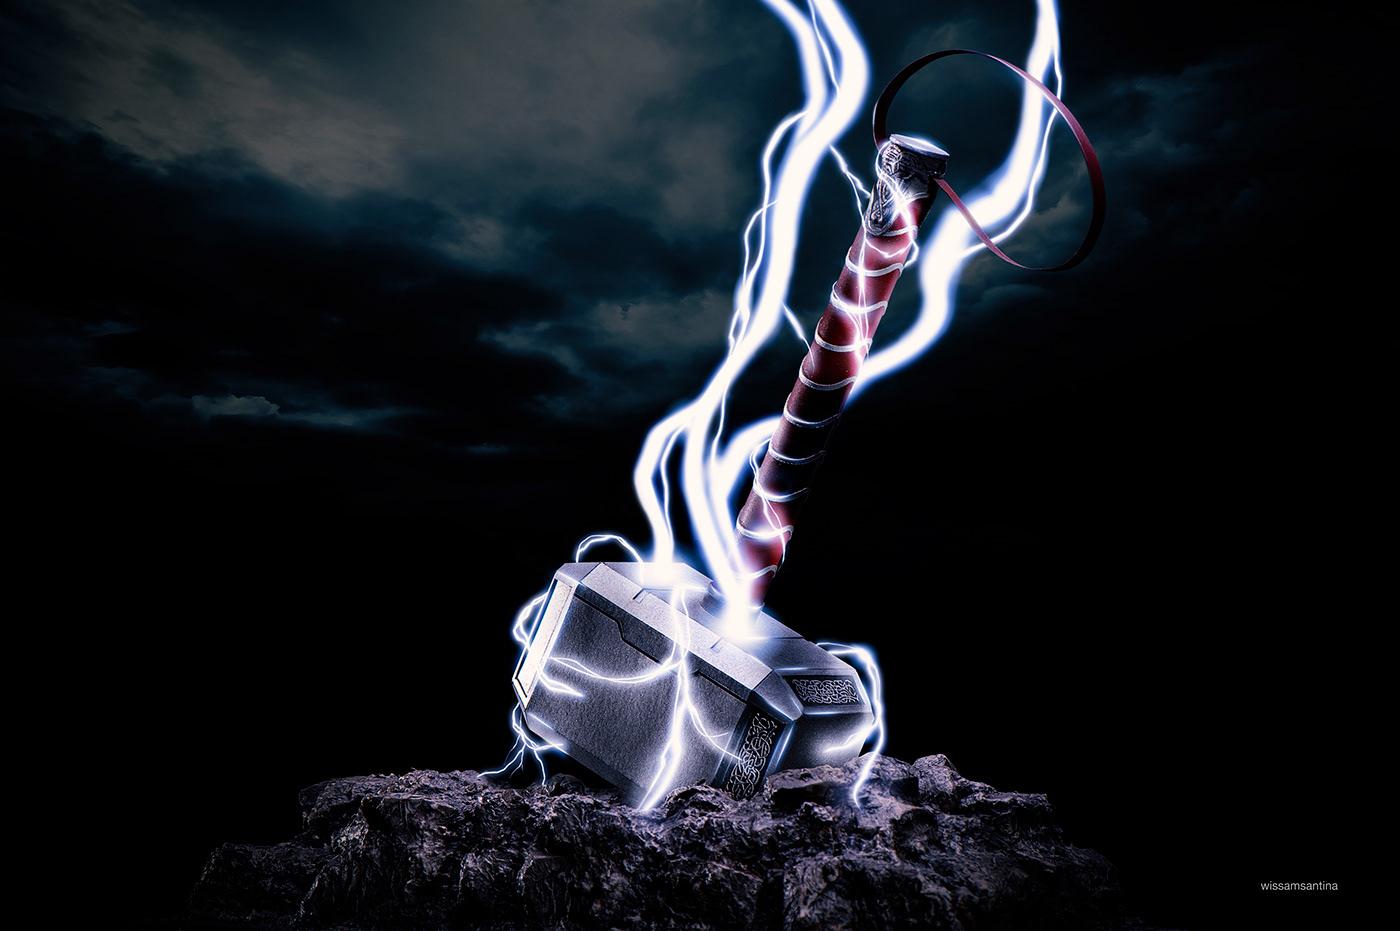 craft,Diorama,hammer,Hero,marvel,Mjolnir,power,rocks,Thor,thunder